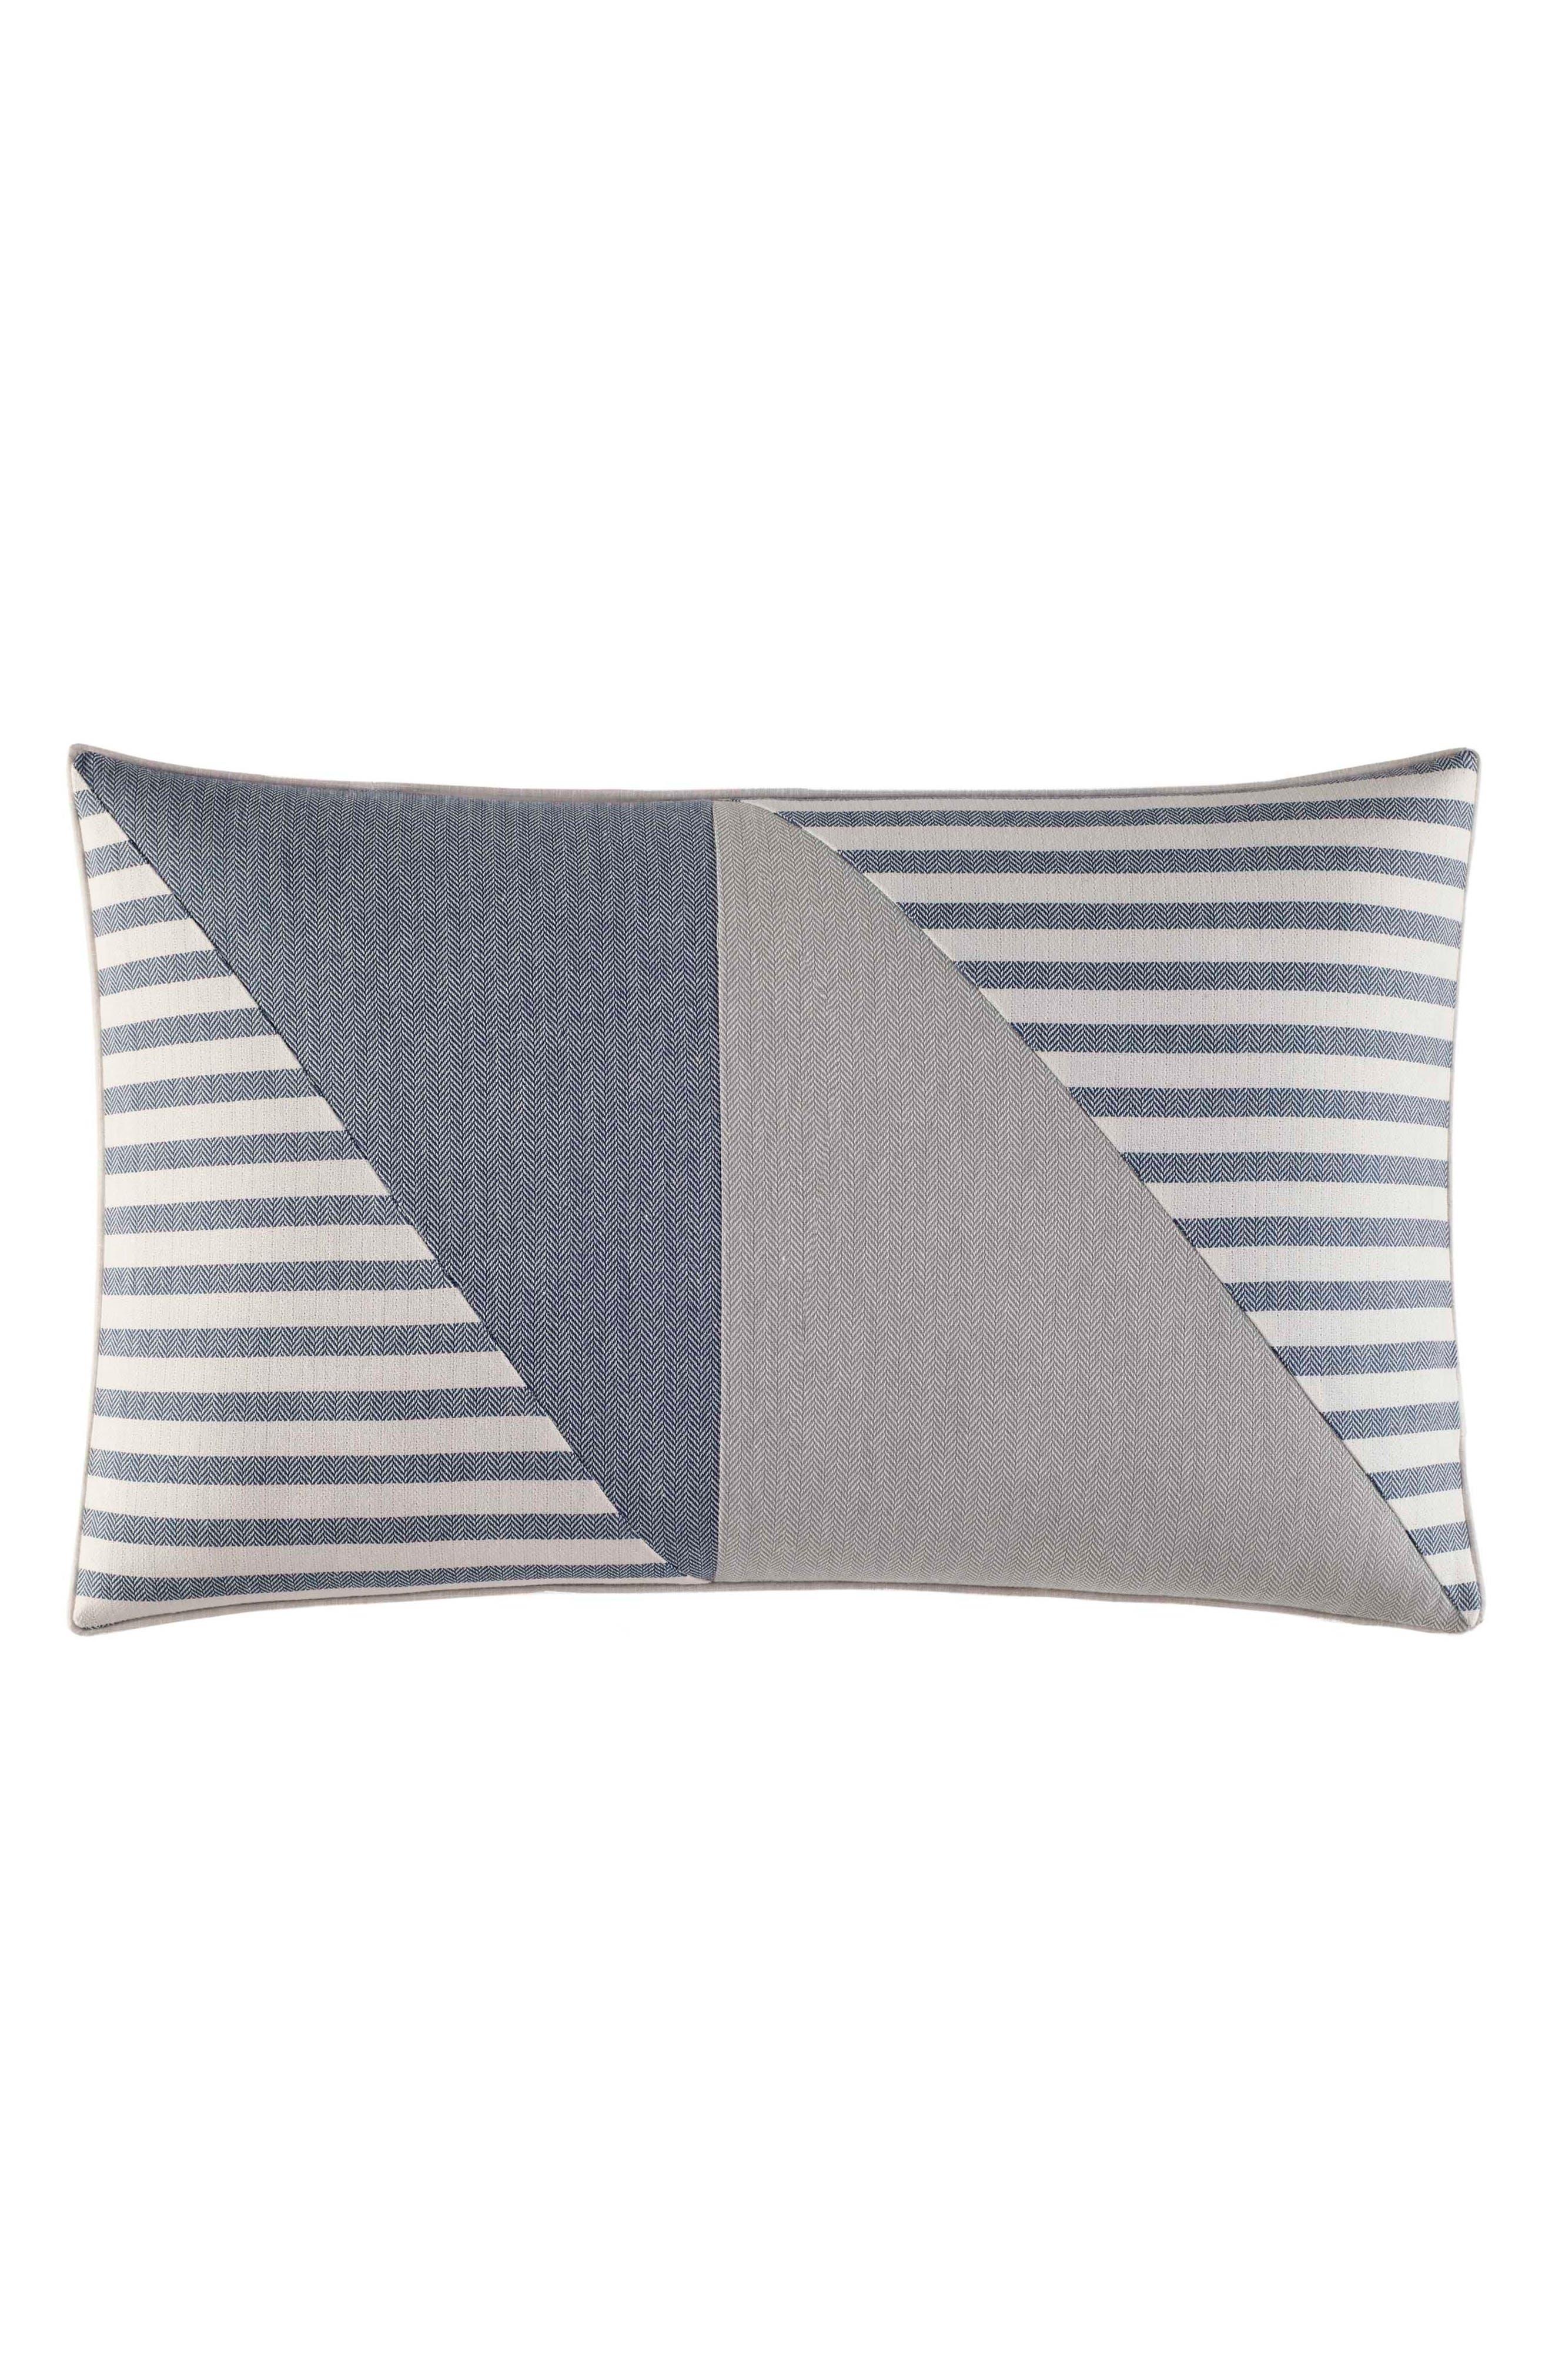 Fairwater Pillow,                             Main thumbnail 1, color,                             BLUE